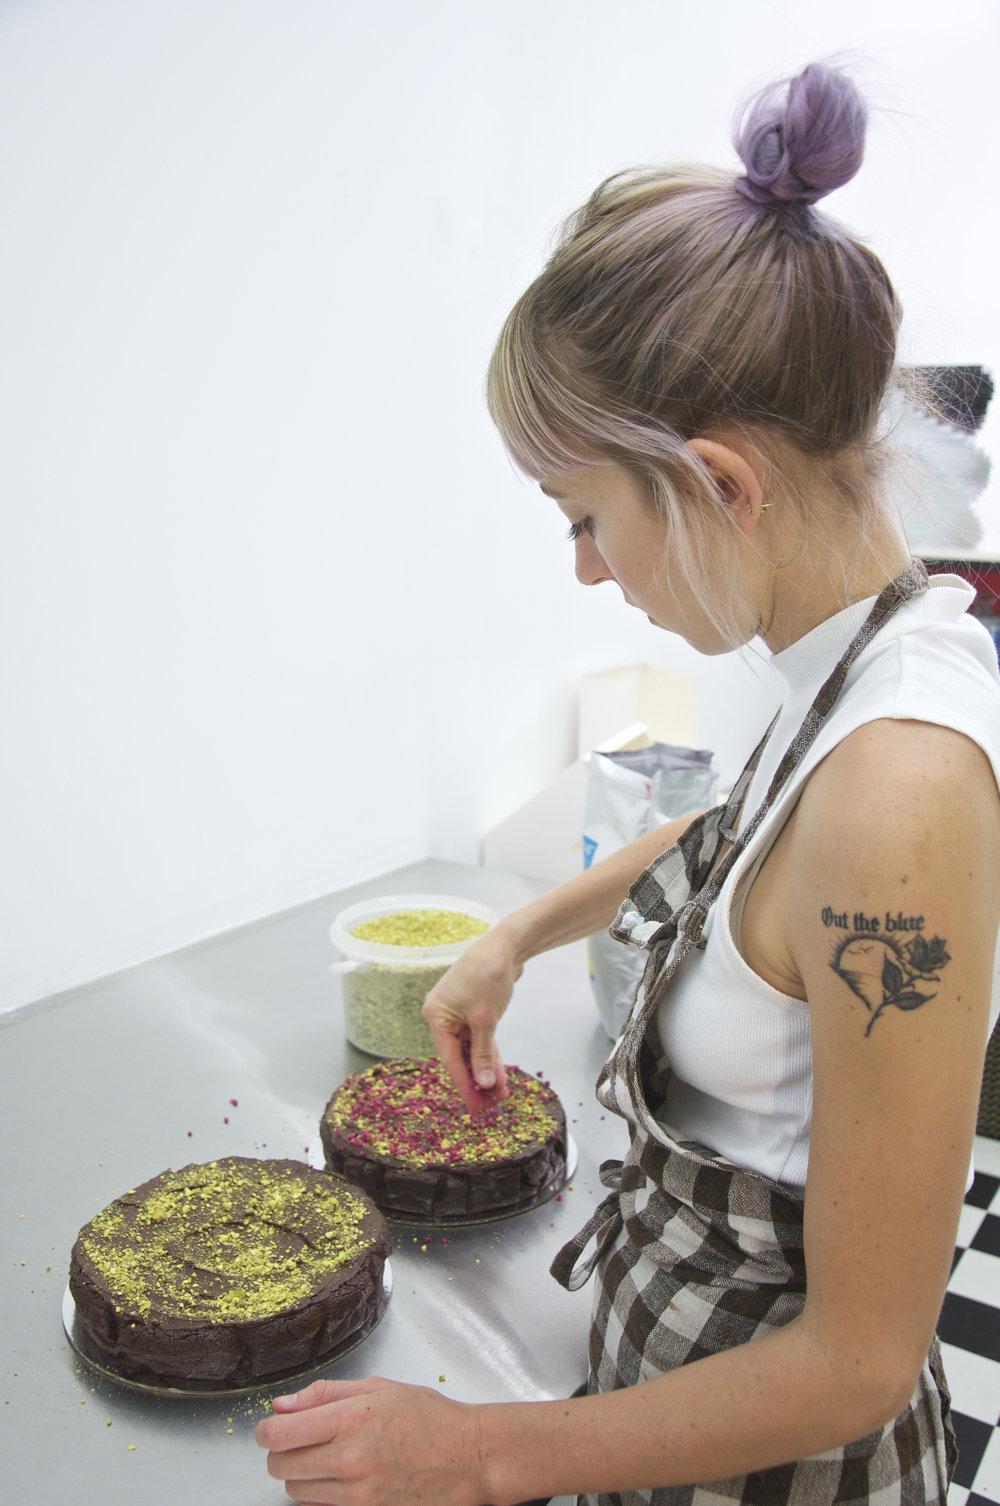 jordan rondel the caker making flourless dark chocolate cake